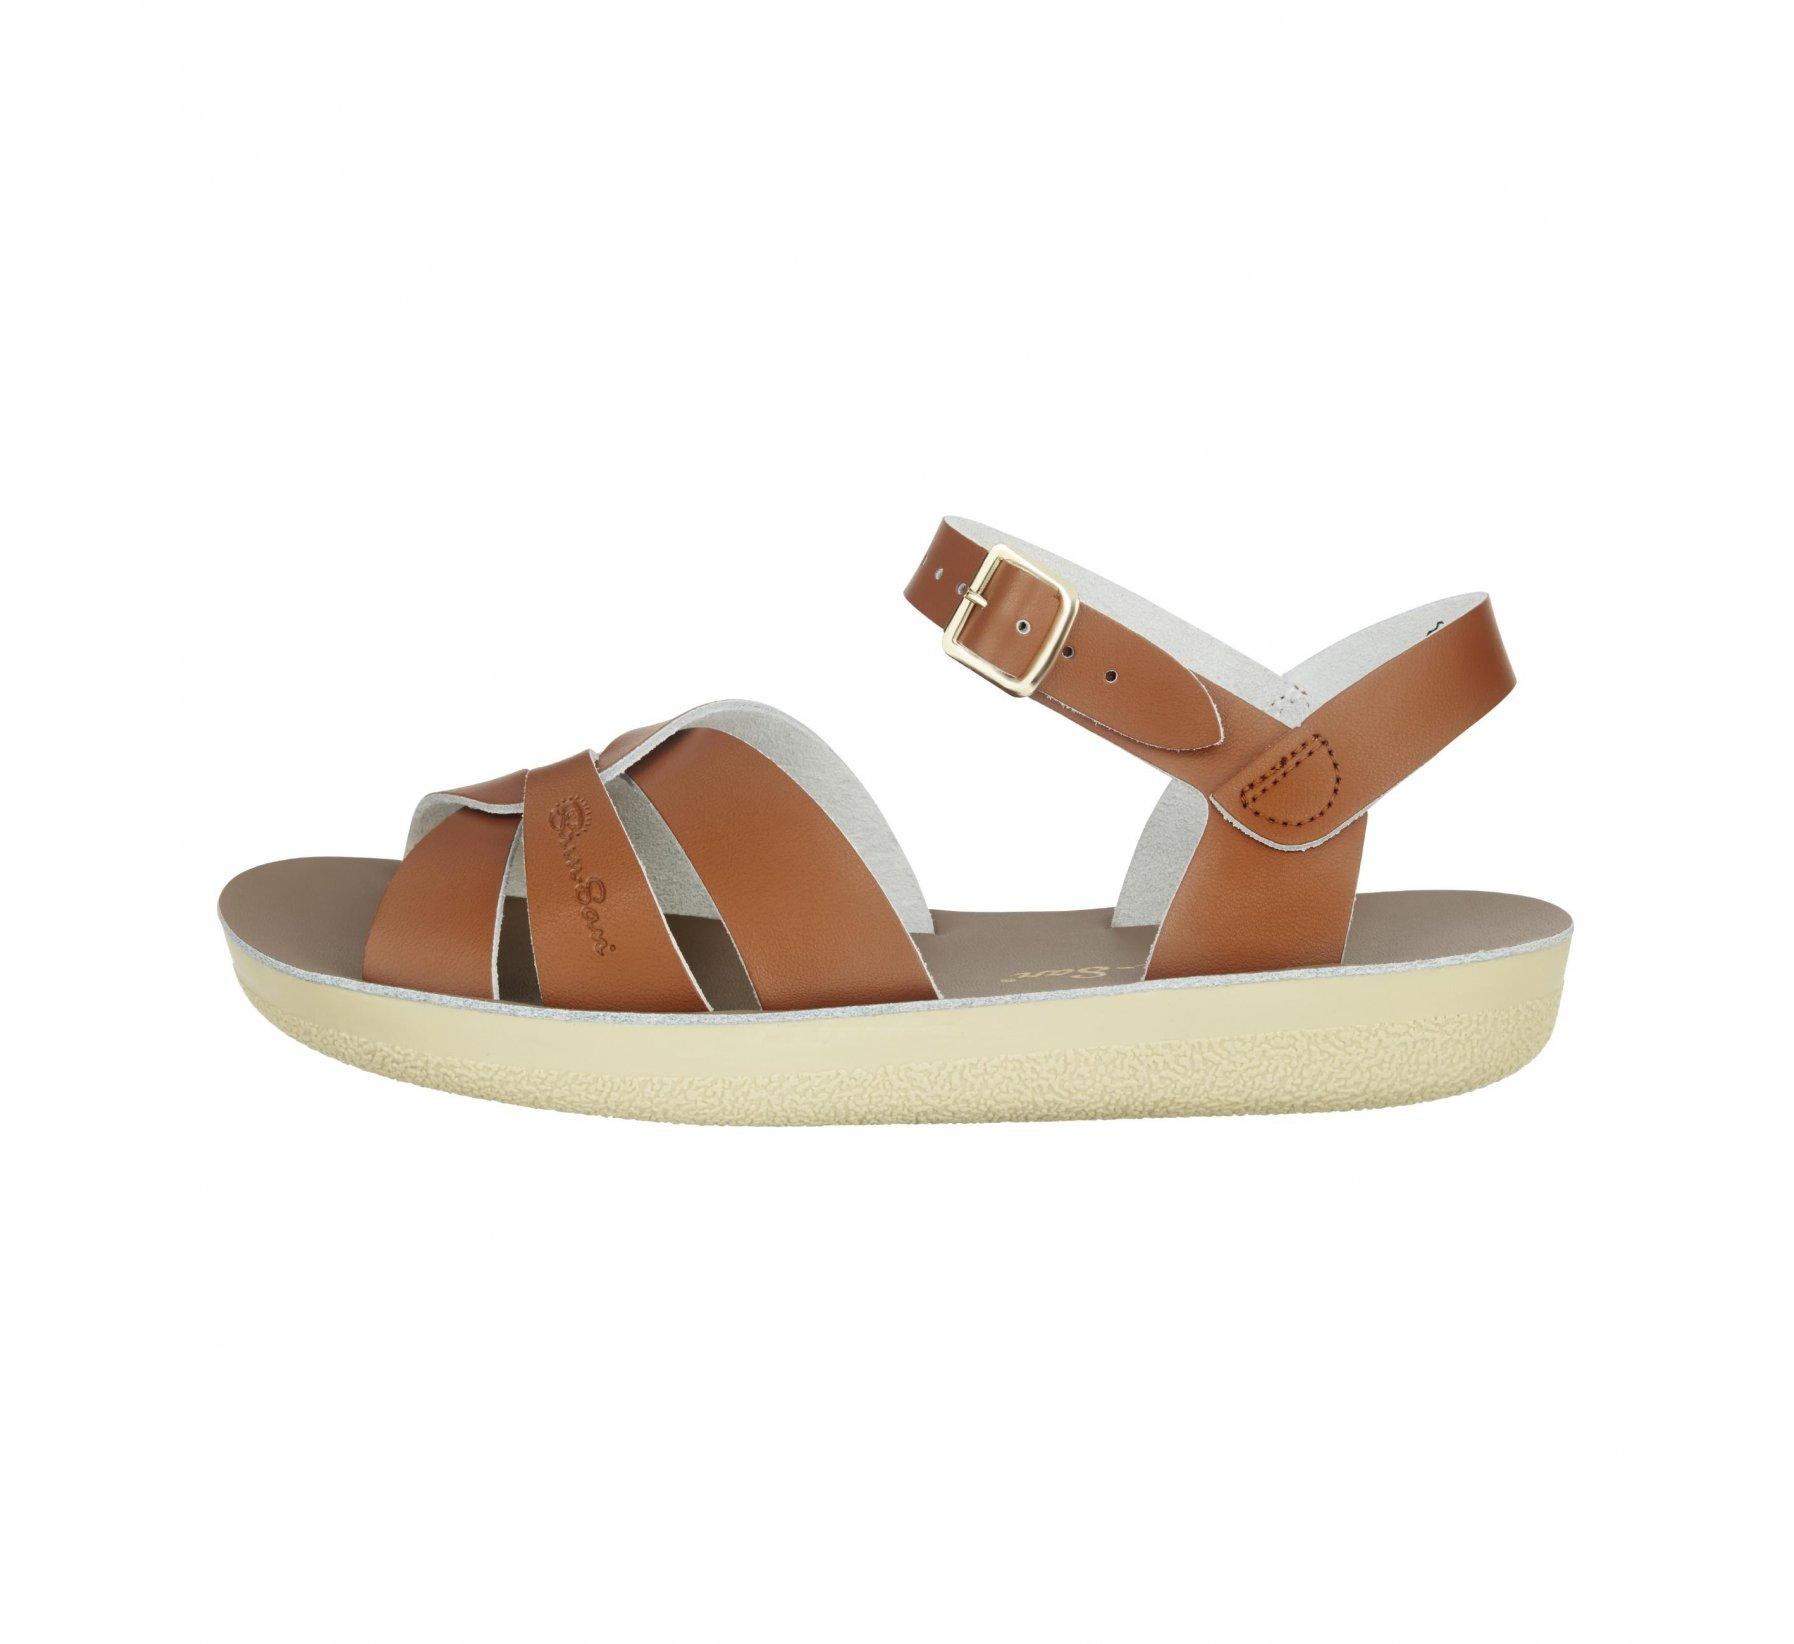 Swimmer Tan - Salt Water Sandals